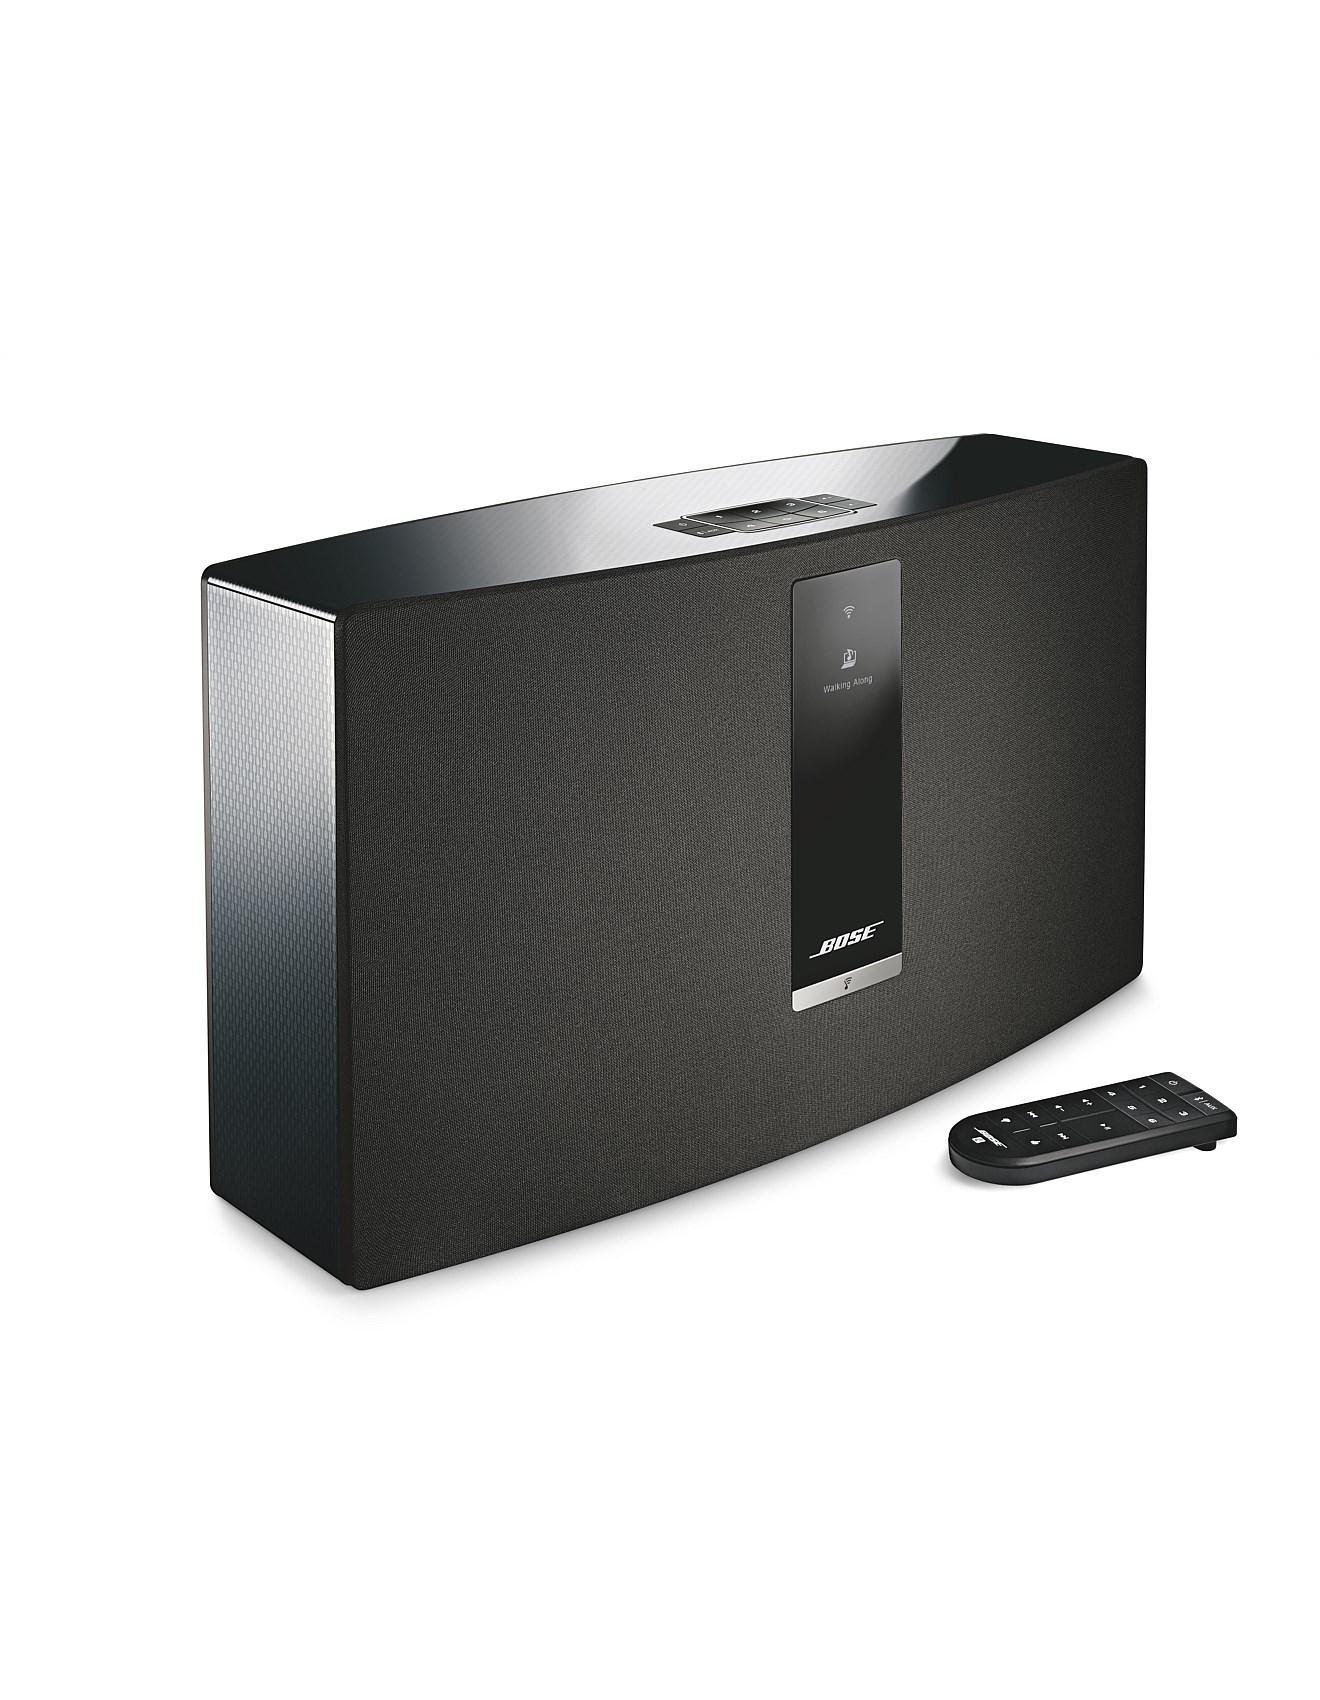 bose shop bose headphones speakers online david jones soundtouch 30 series iii wireless. Black Bedroom Furniture Sets. Home Design Ideas